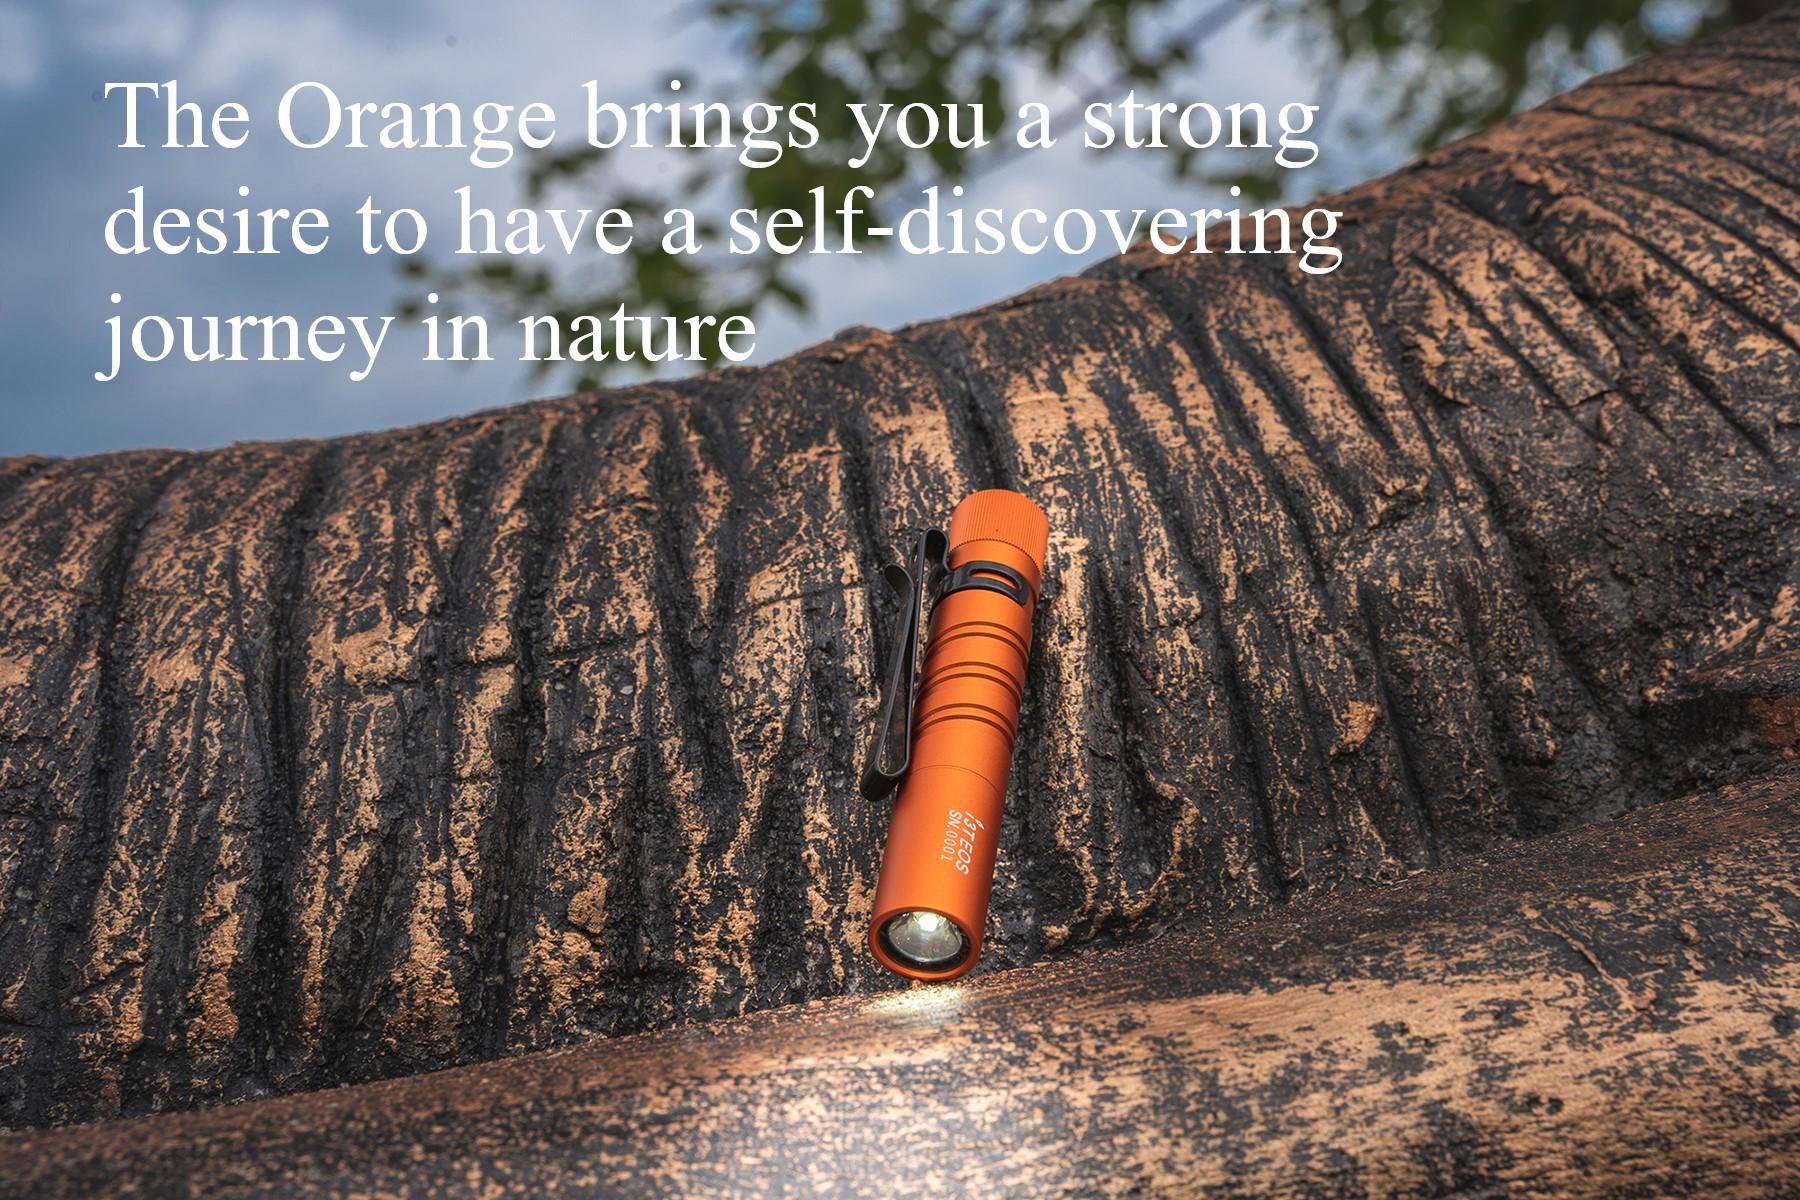 Olight I3T EOS Orange Small Flashlight Candied Orange